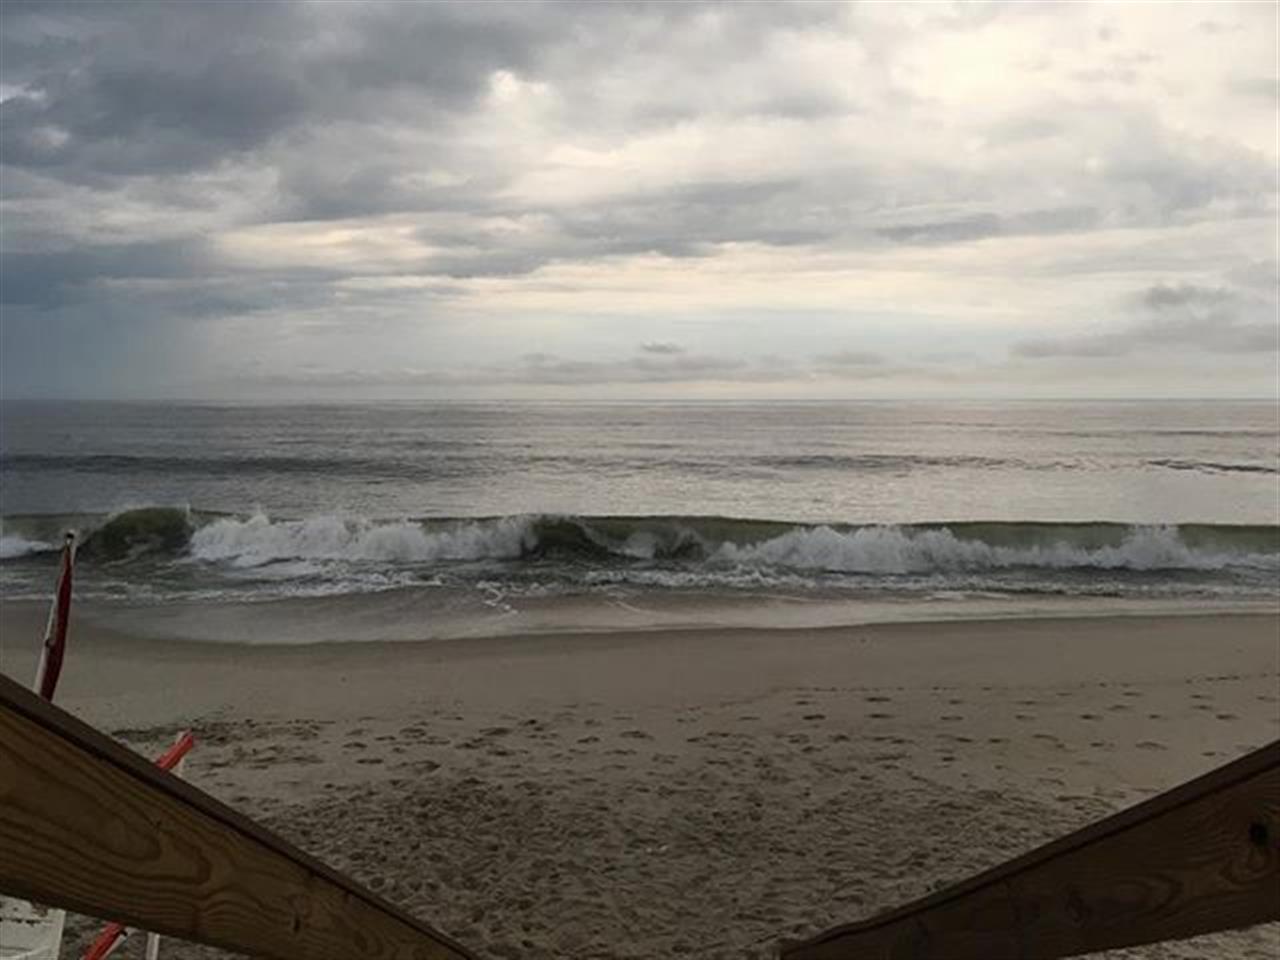 Gray and stormy morning... #goodmorning #nj #sunrise #stormy #jshn